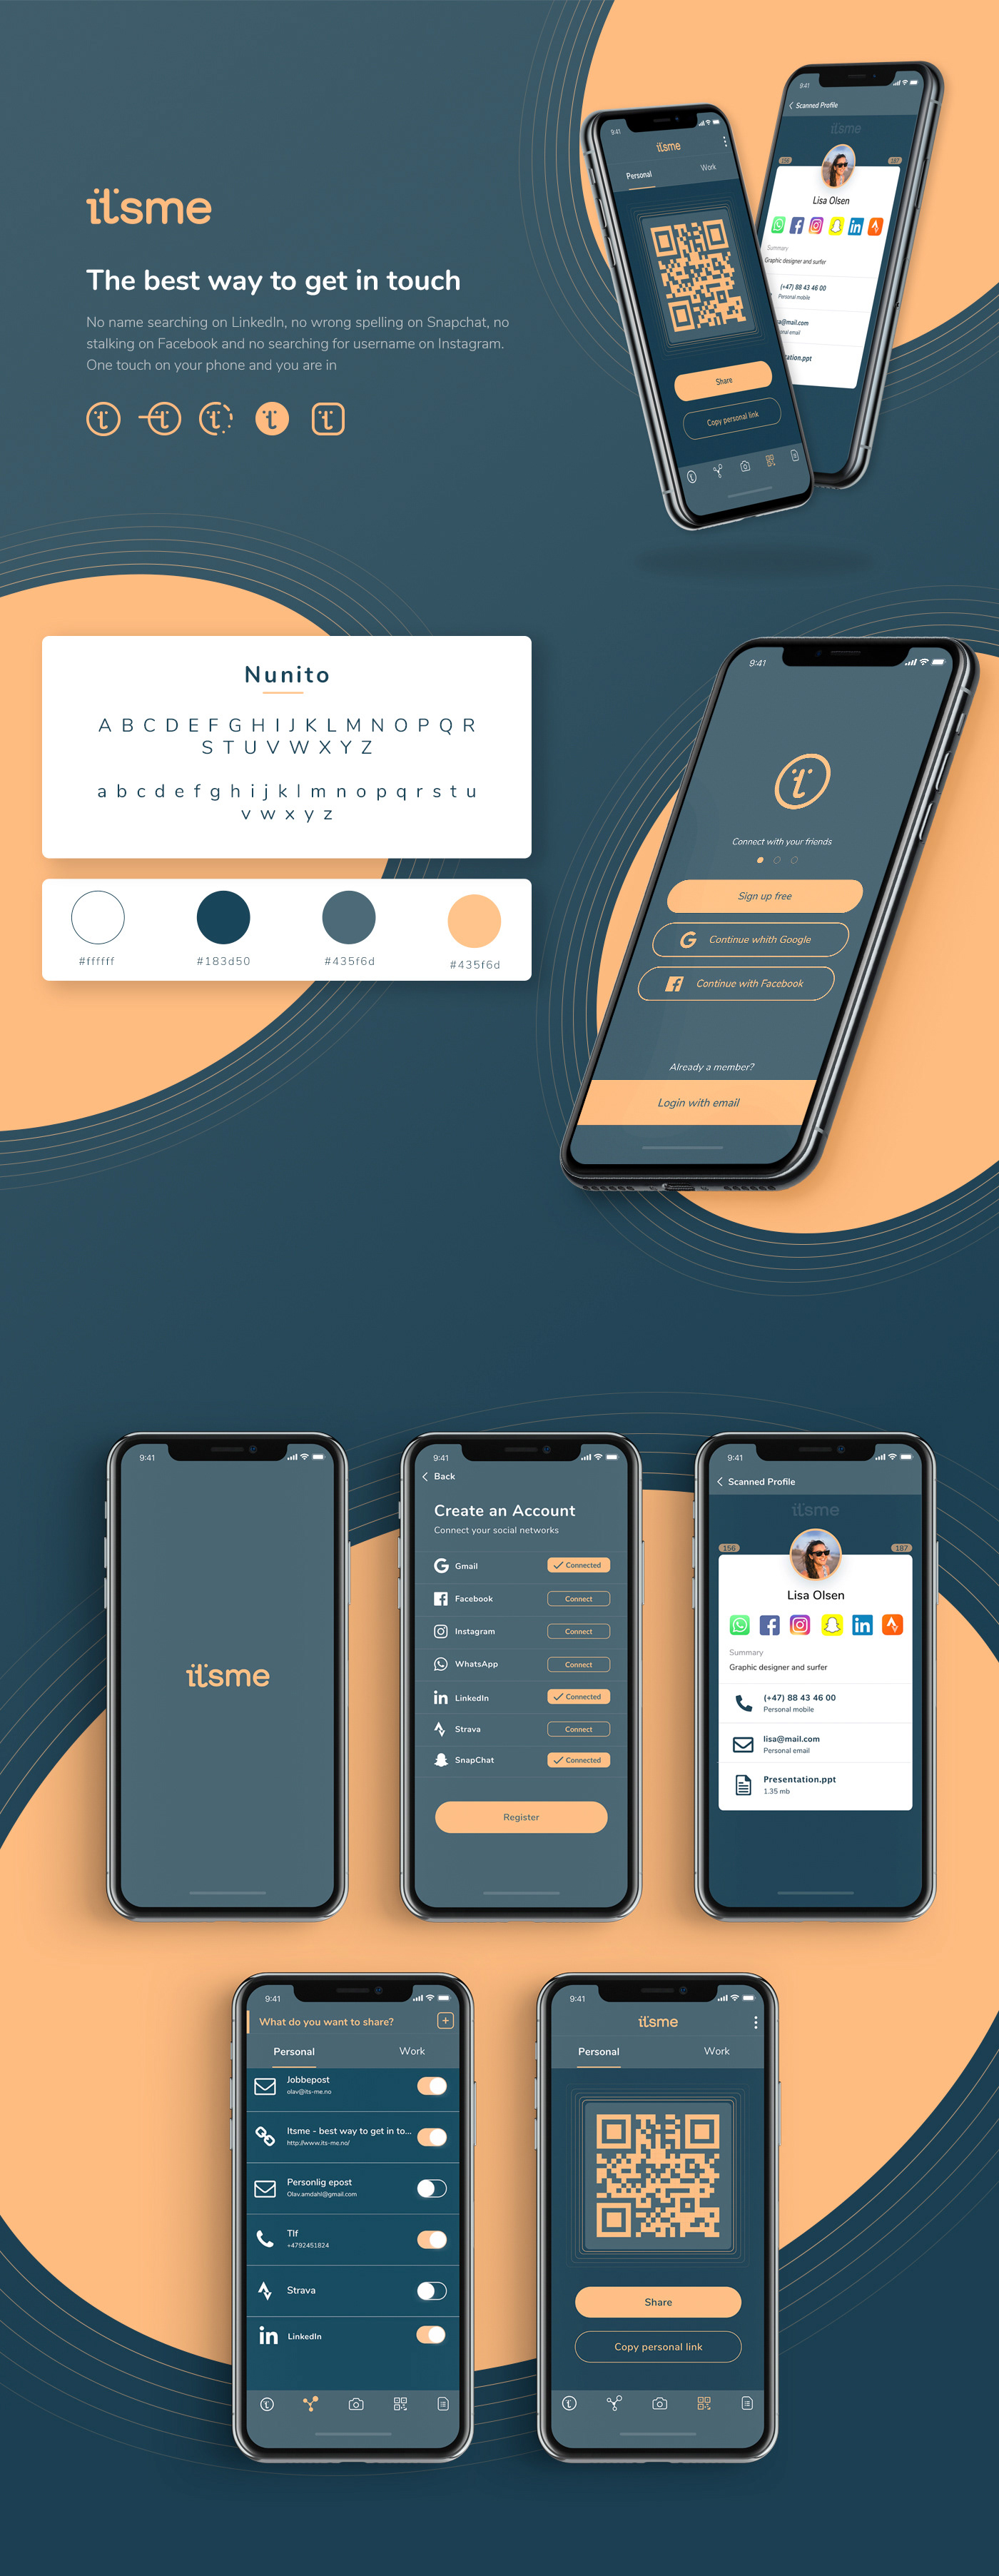 Business card scanner app Contact Management app App for sharing social media accounts social media QR code app